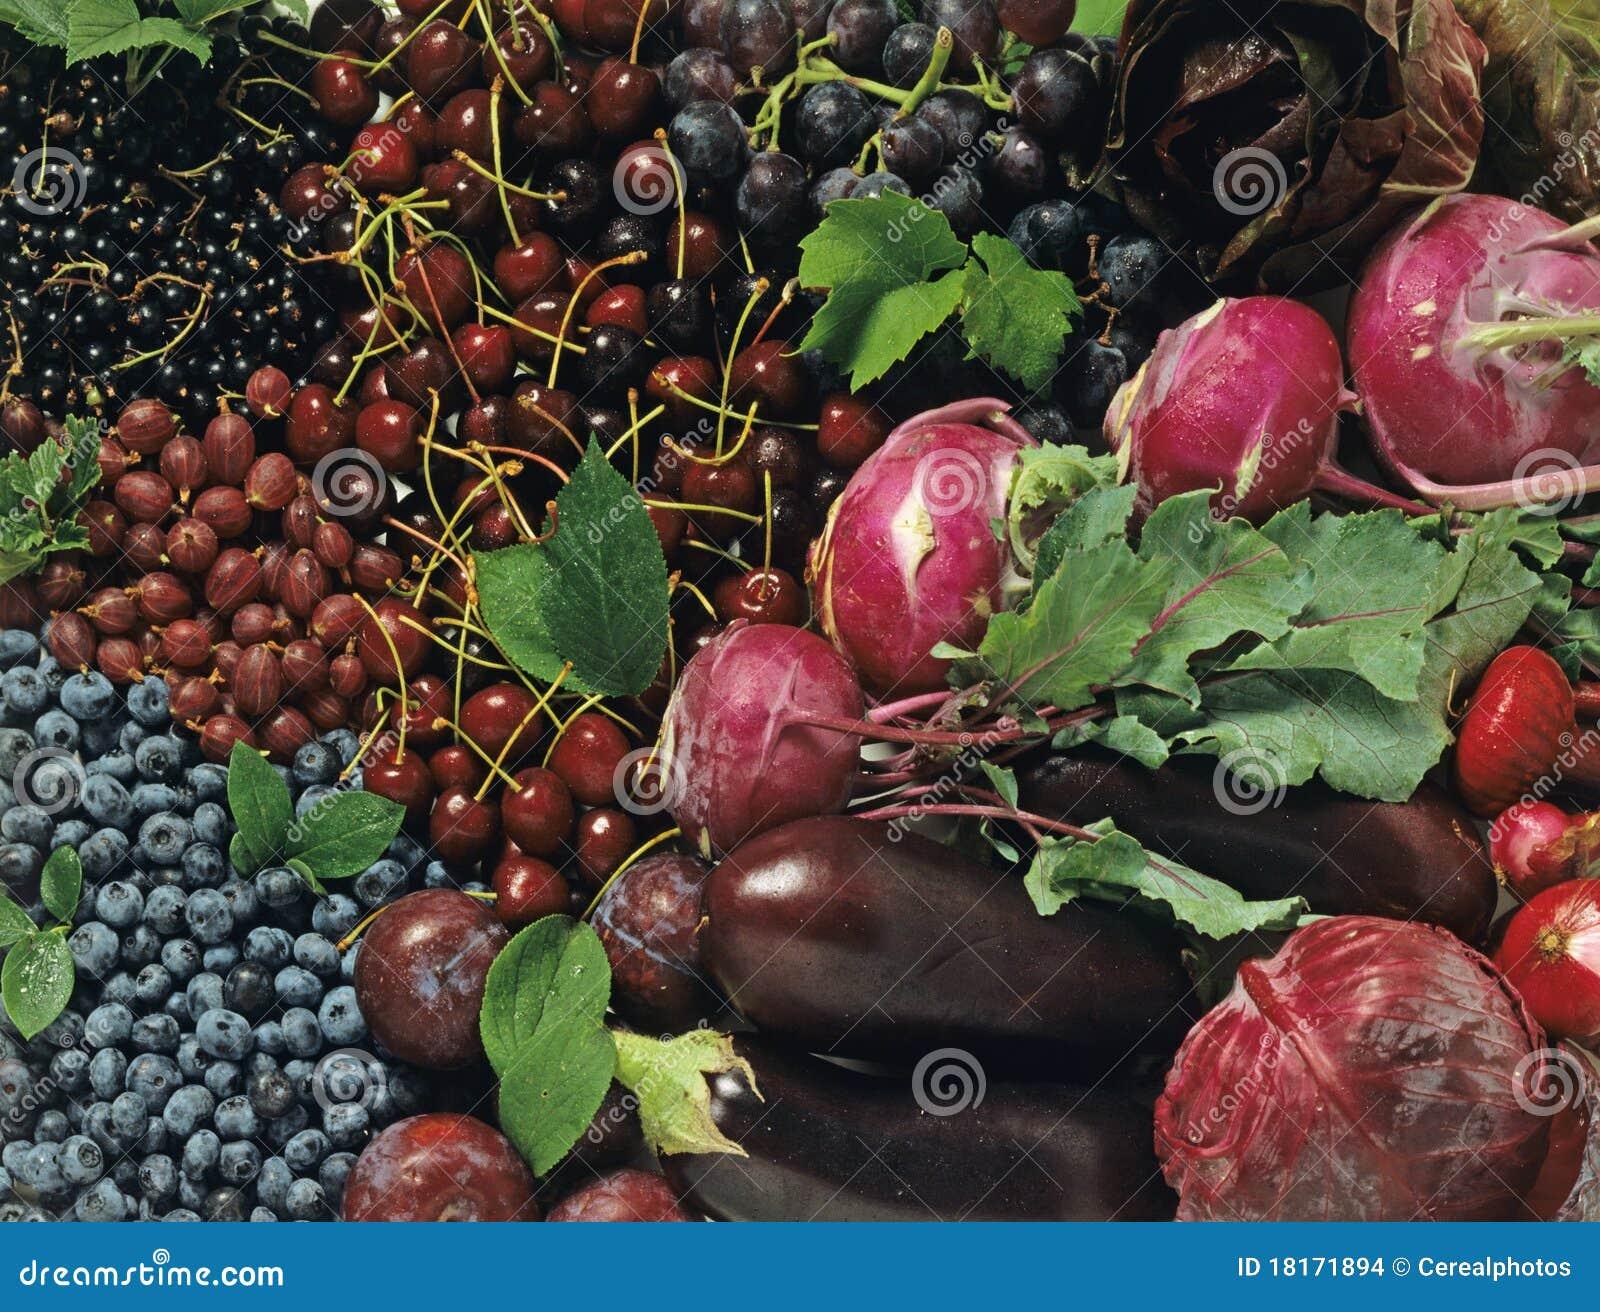 Frutta e verdure blu fotografia stock immagine di - Immagine di frutta e verdura ...